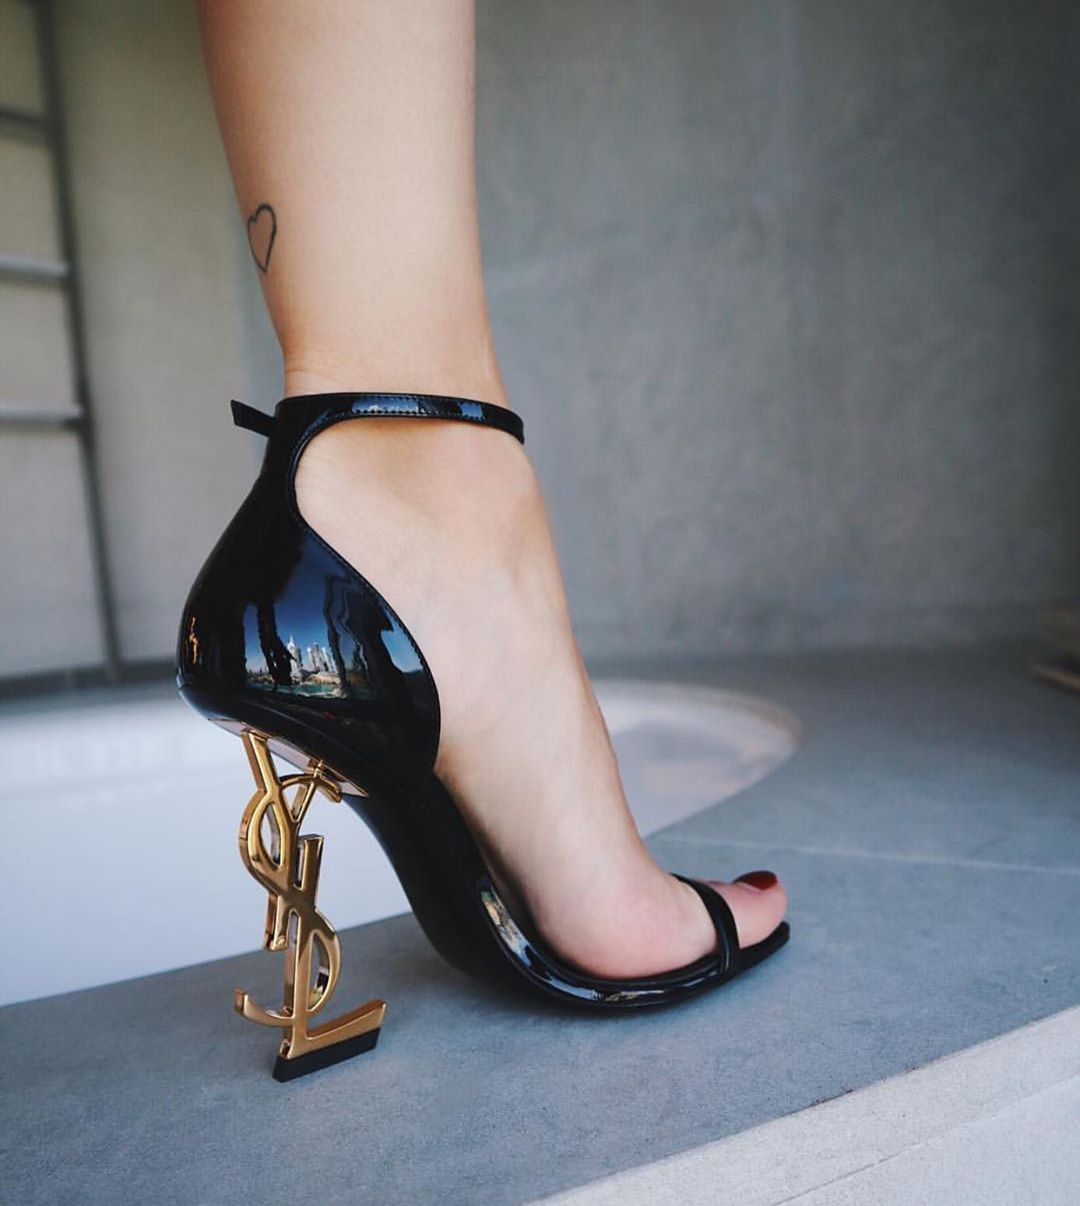 ysl sparkly heels